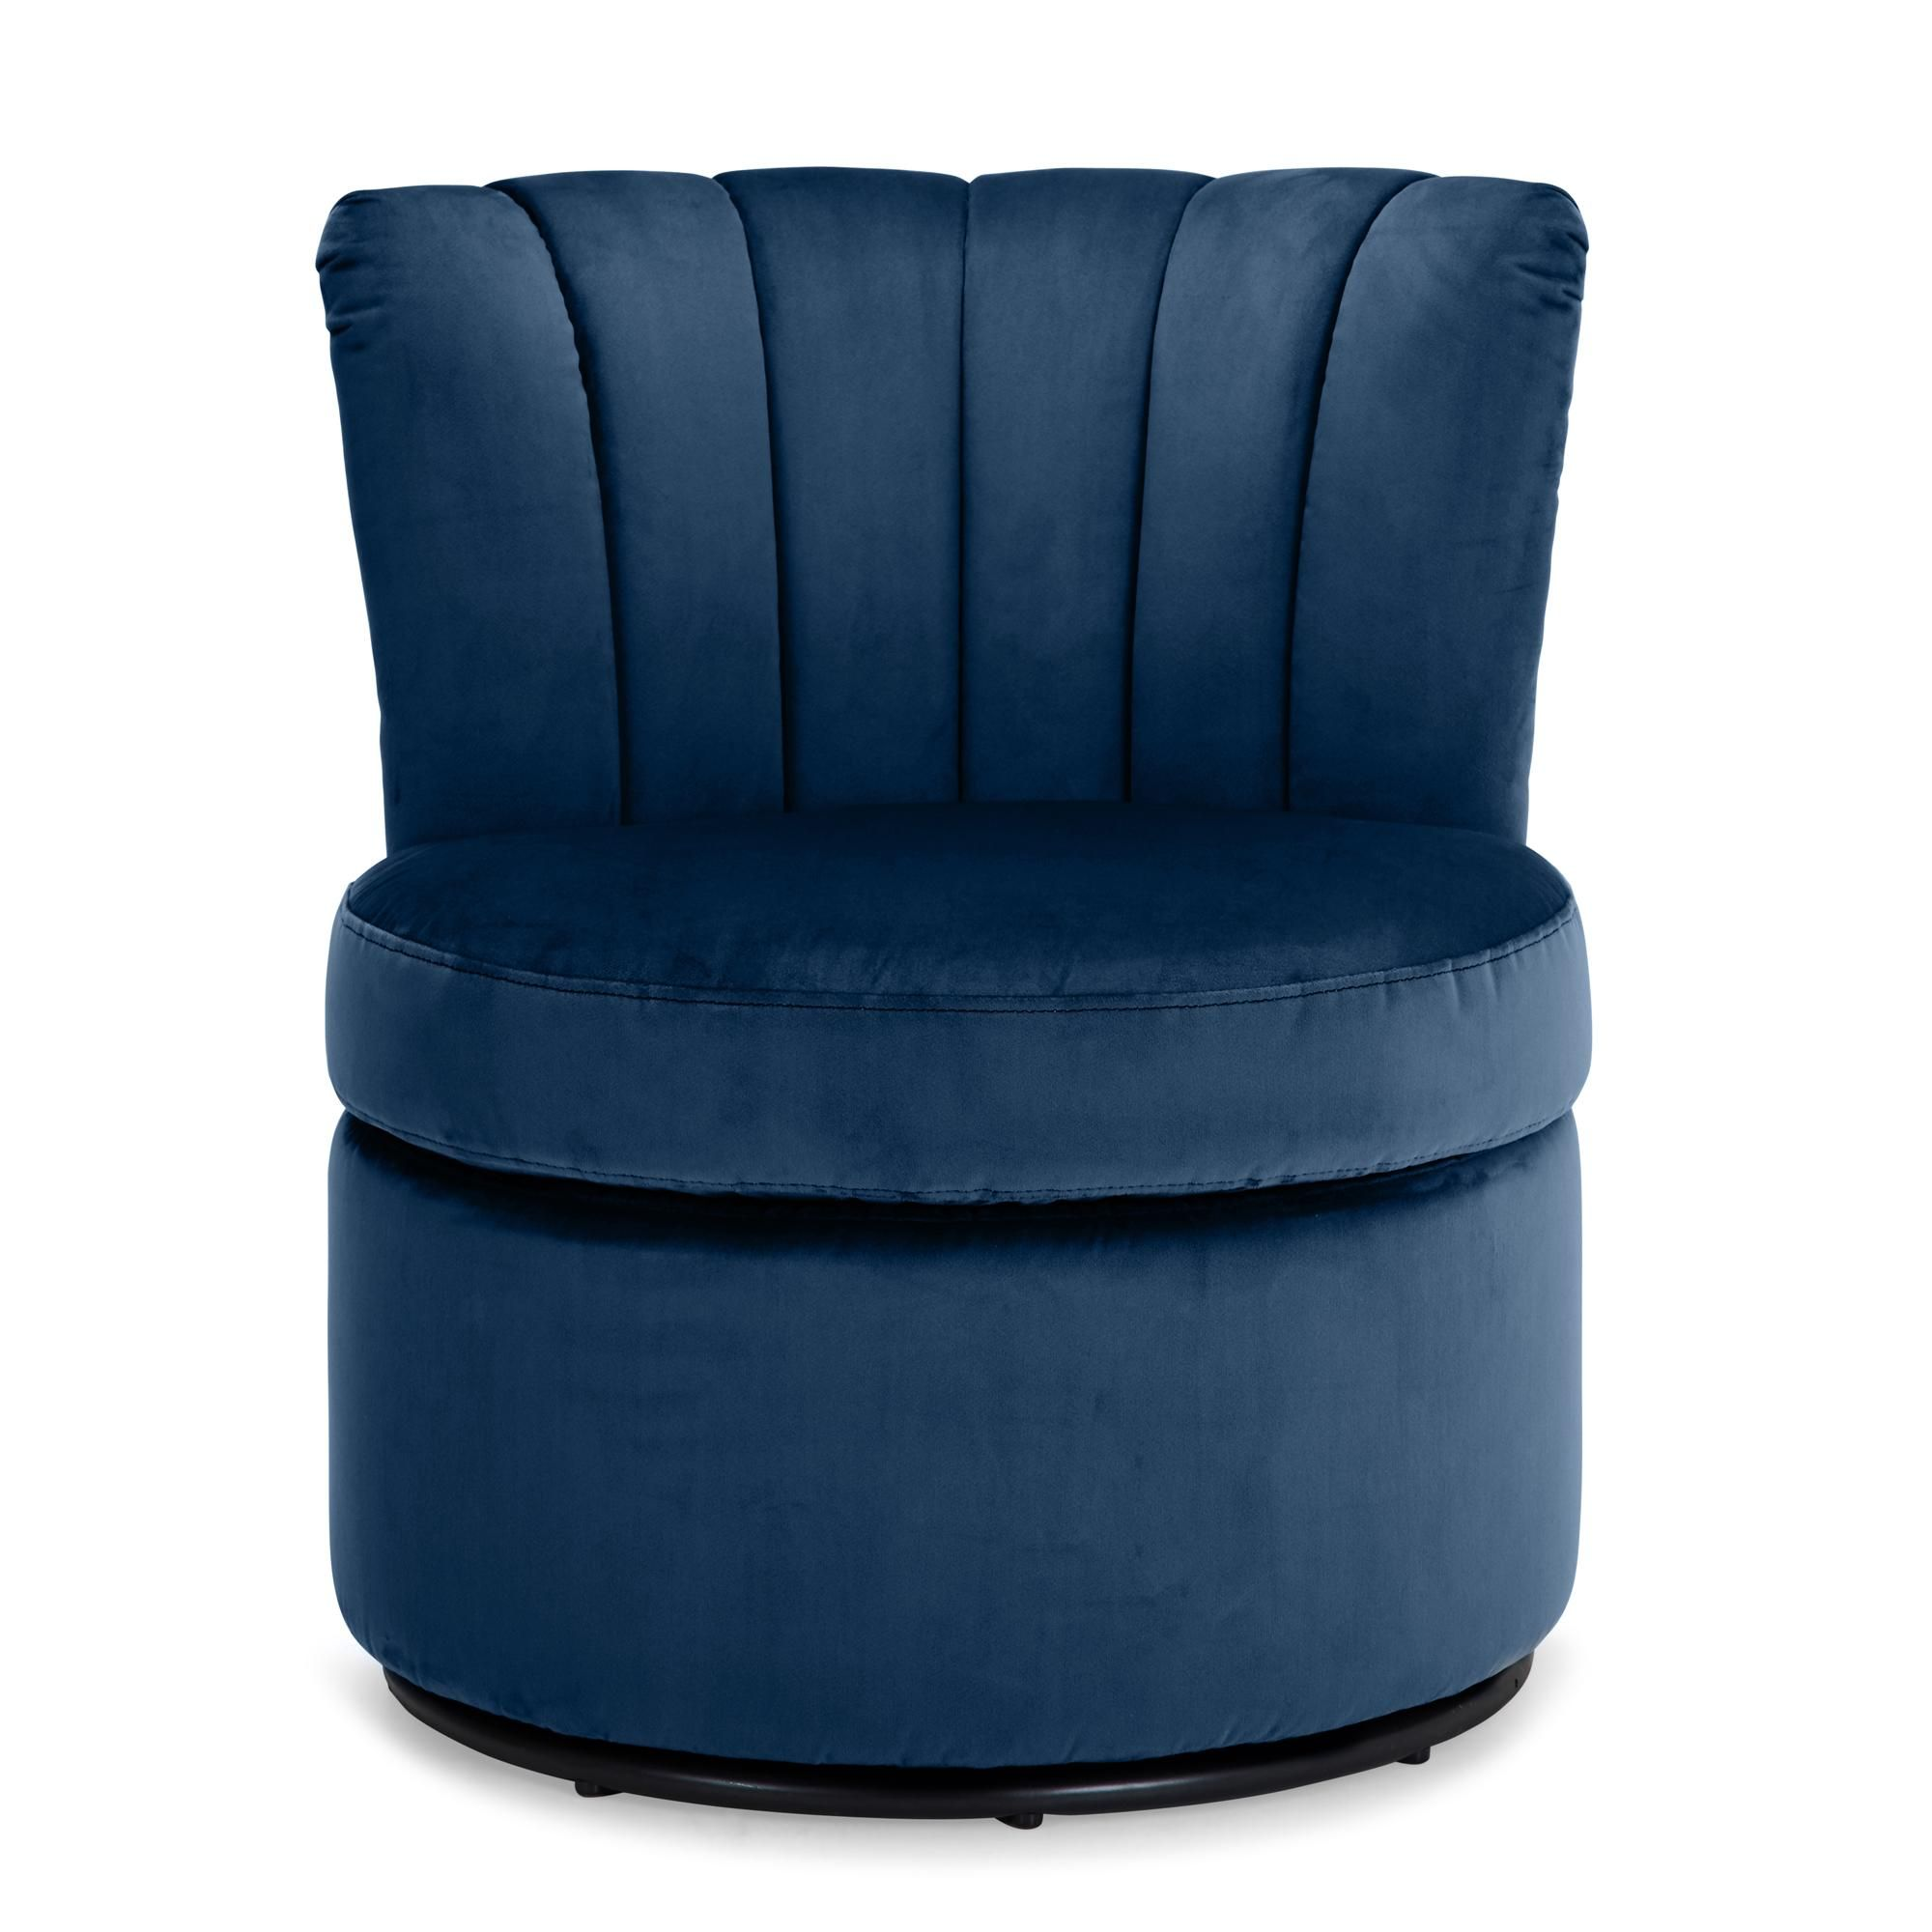 Esme Boudoir Swivel Chair - Midnight Blue